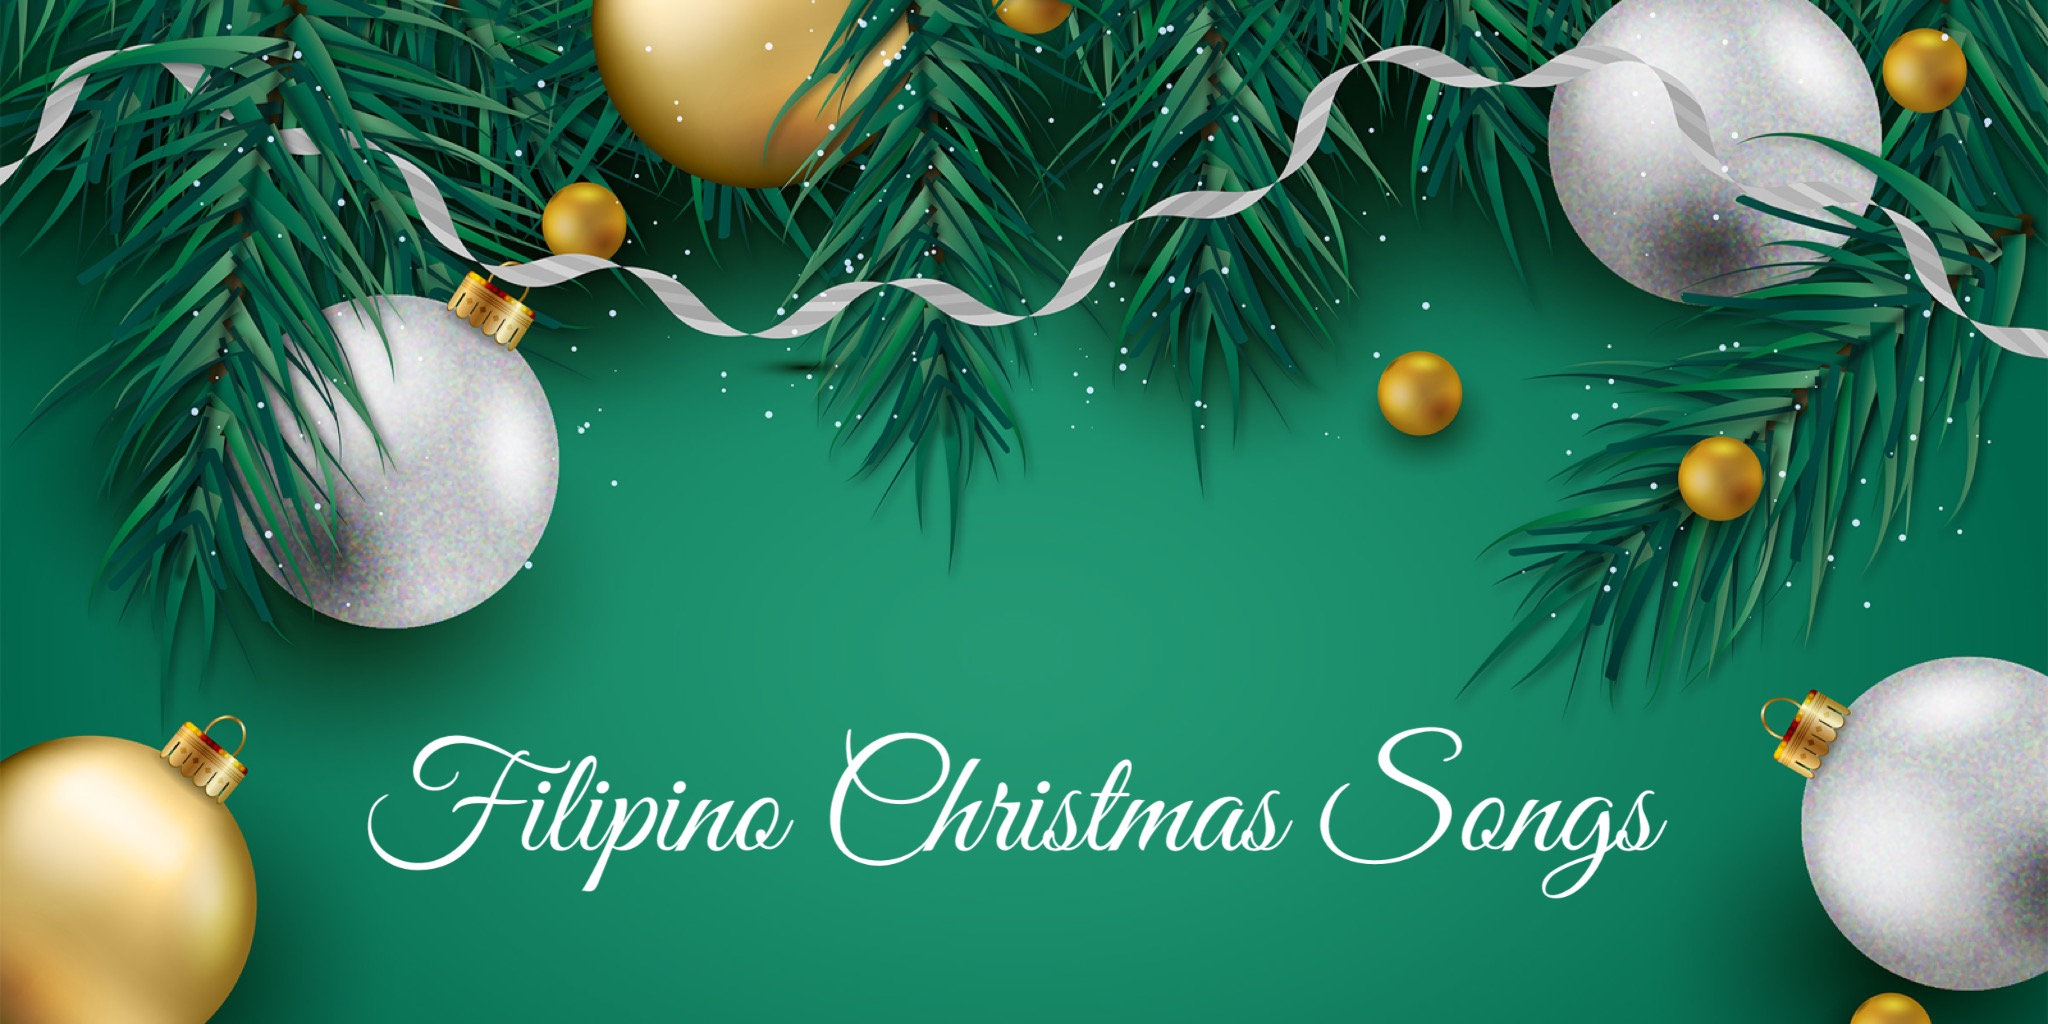 Christmas holiday songs lyrics